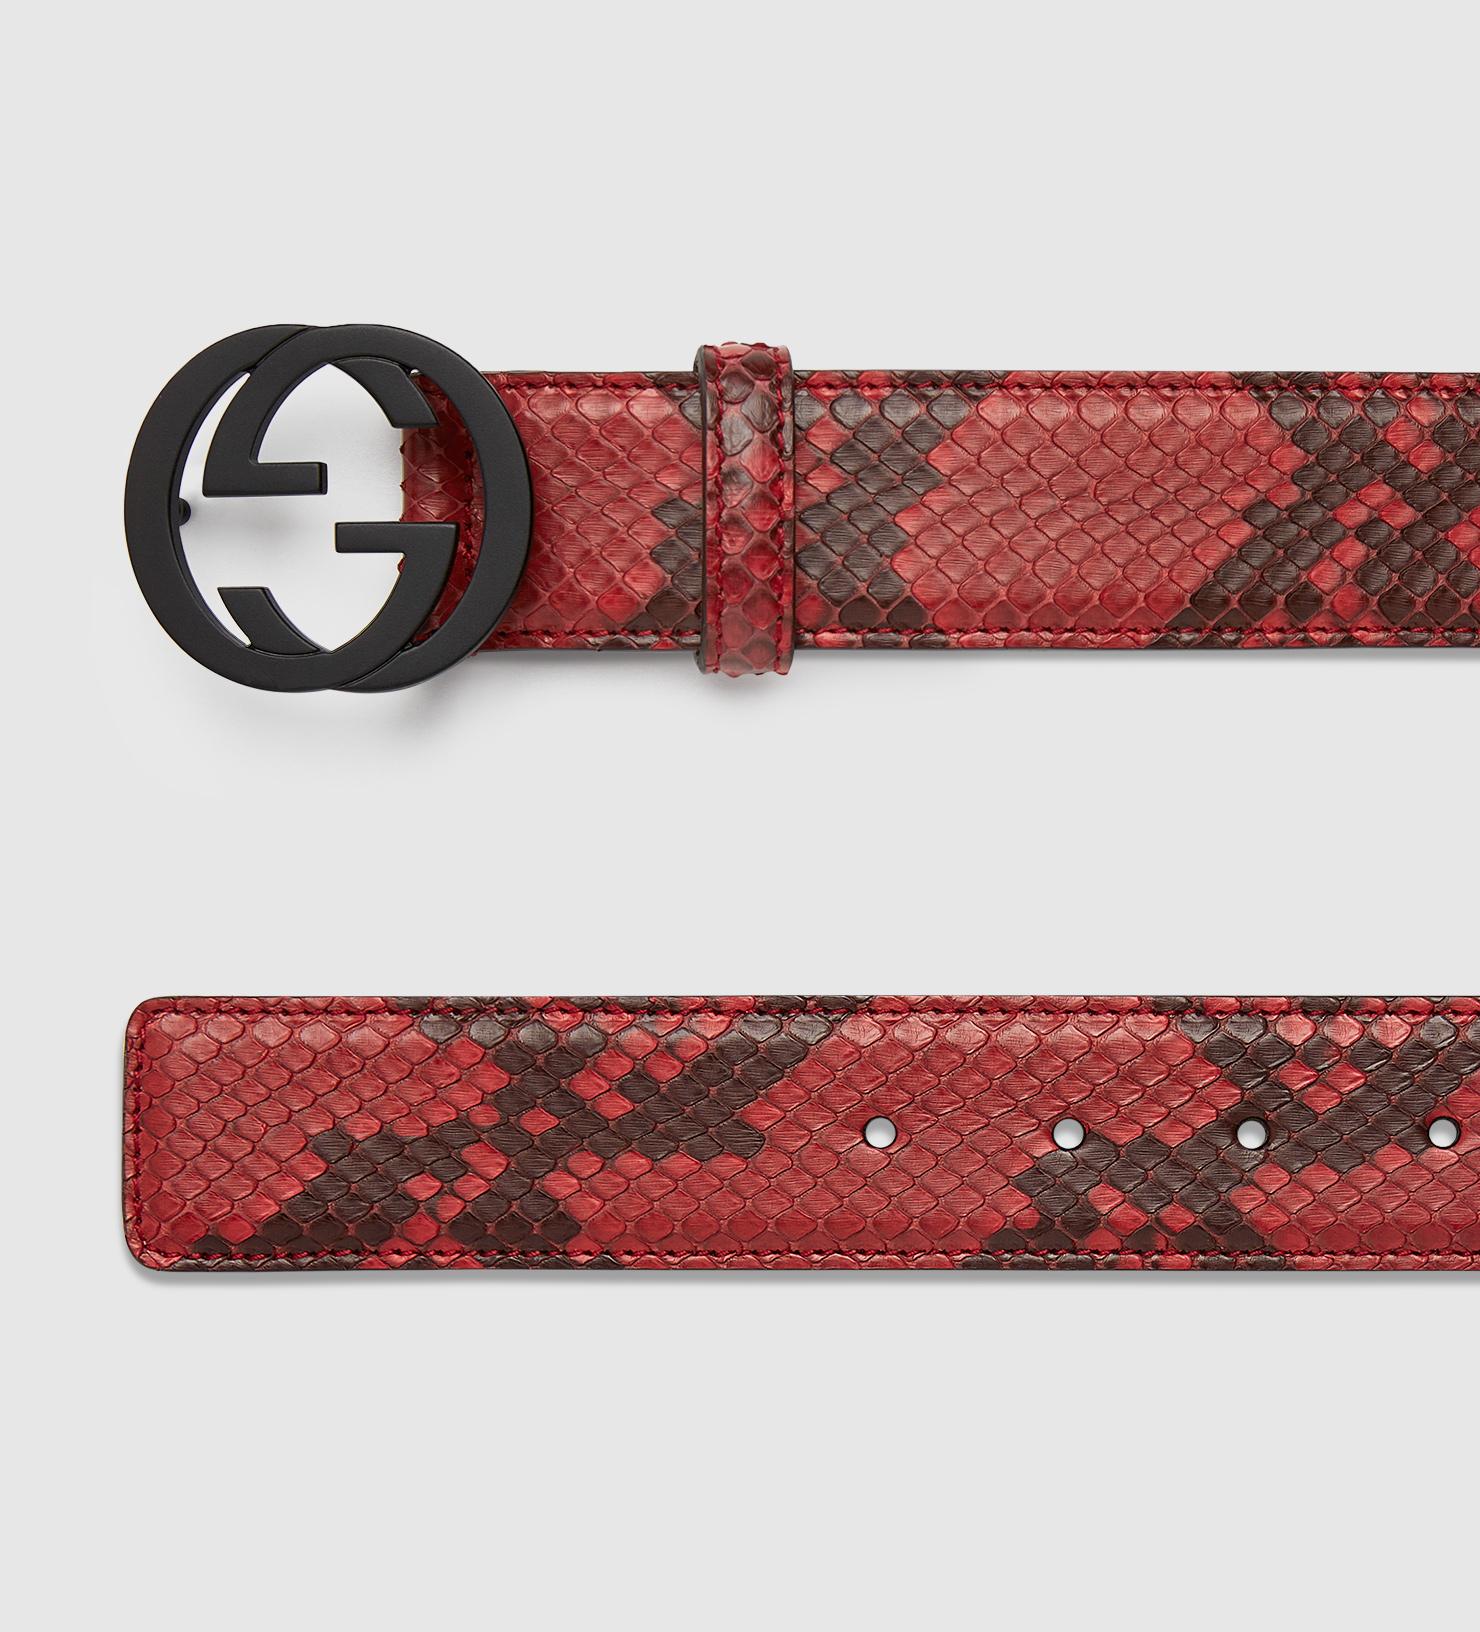 New Gucci Belts | Womens Fendi Belt | Red Gucci Belt